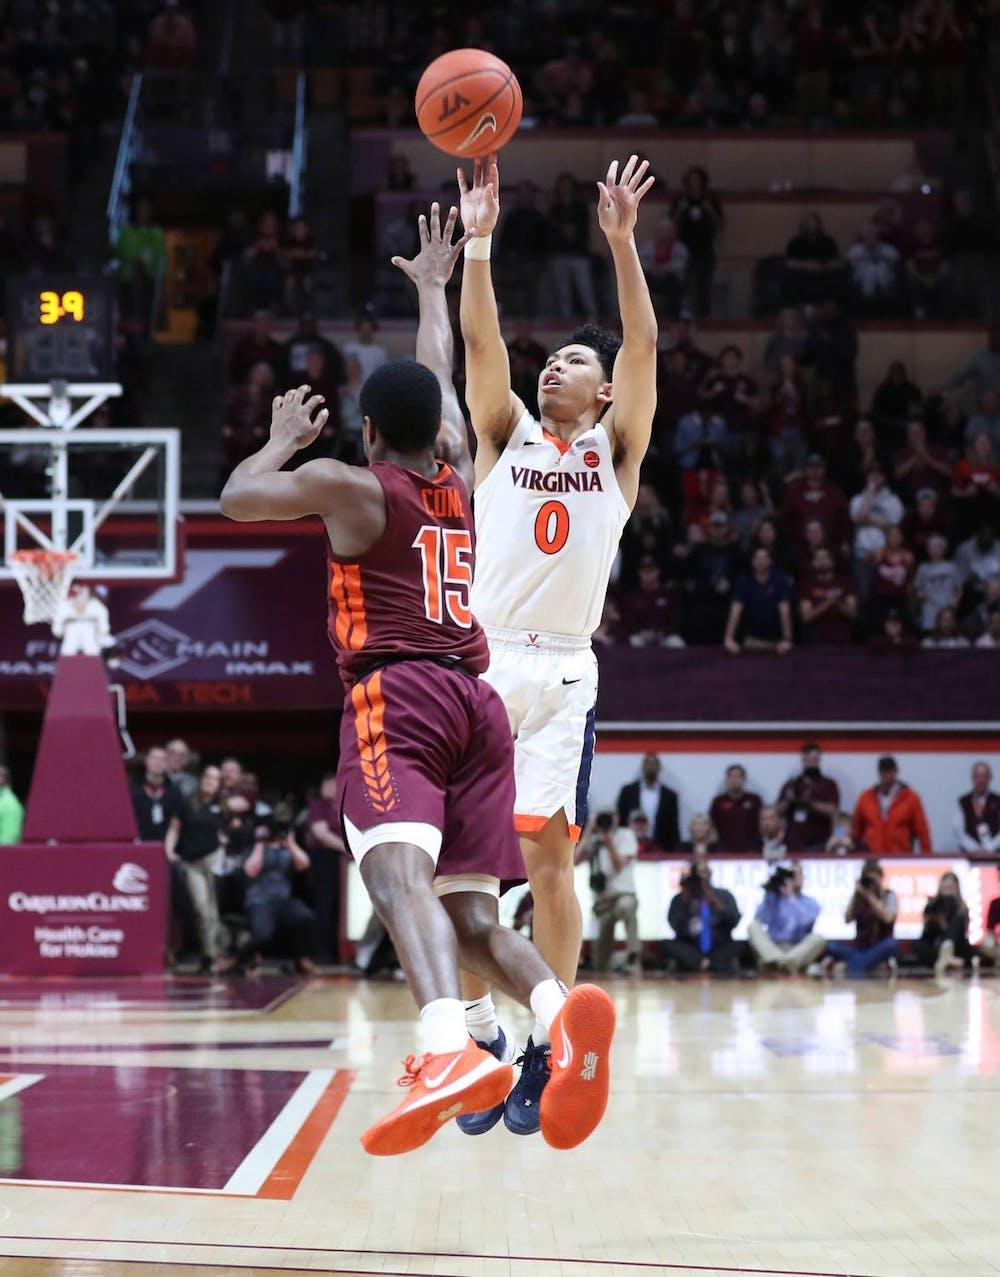 <p>Junior guard Kihei Clark shoots the game-winning three-pointer to beat Virginia Tech in Blacksburg last season</p>